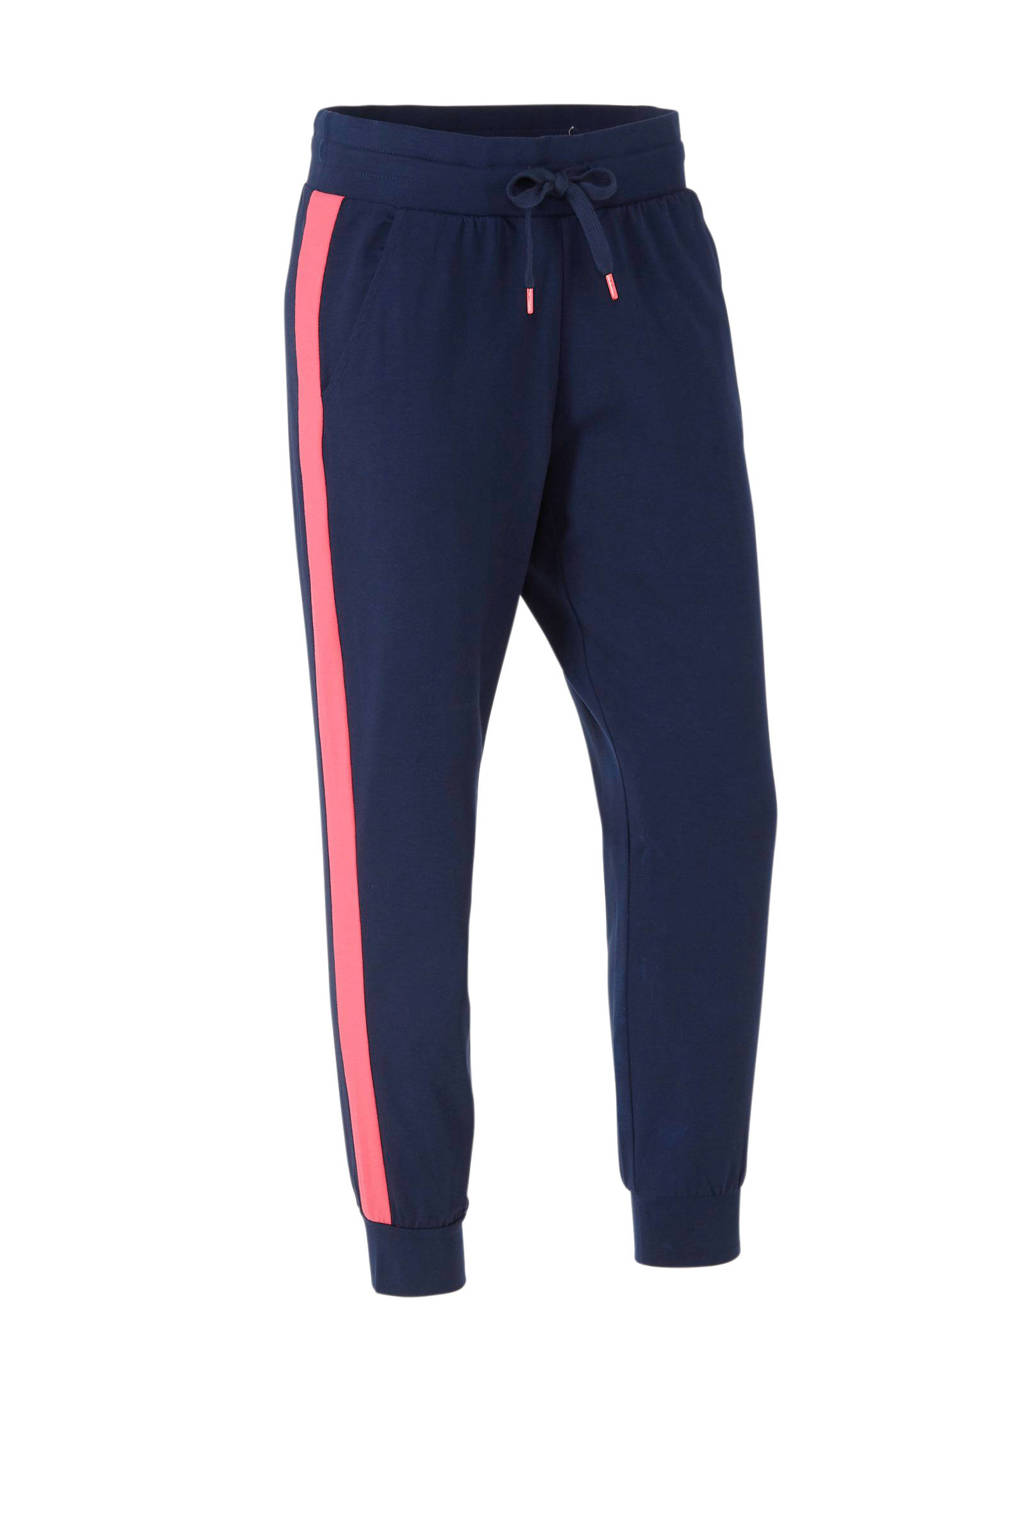 ESPRIT Women Sports joggingbroek donkerblauw, Donkerblauw/roze